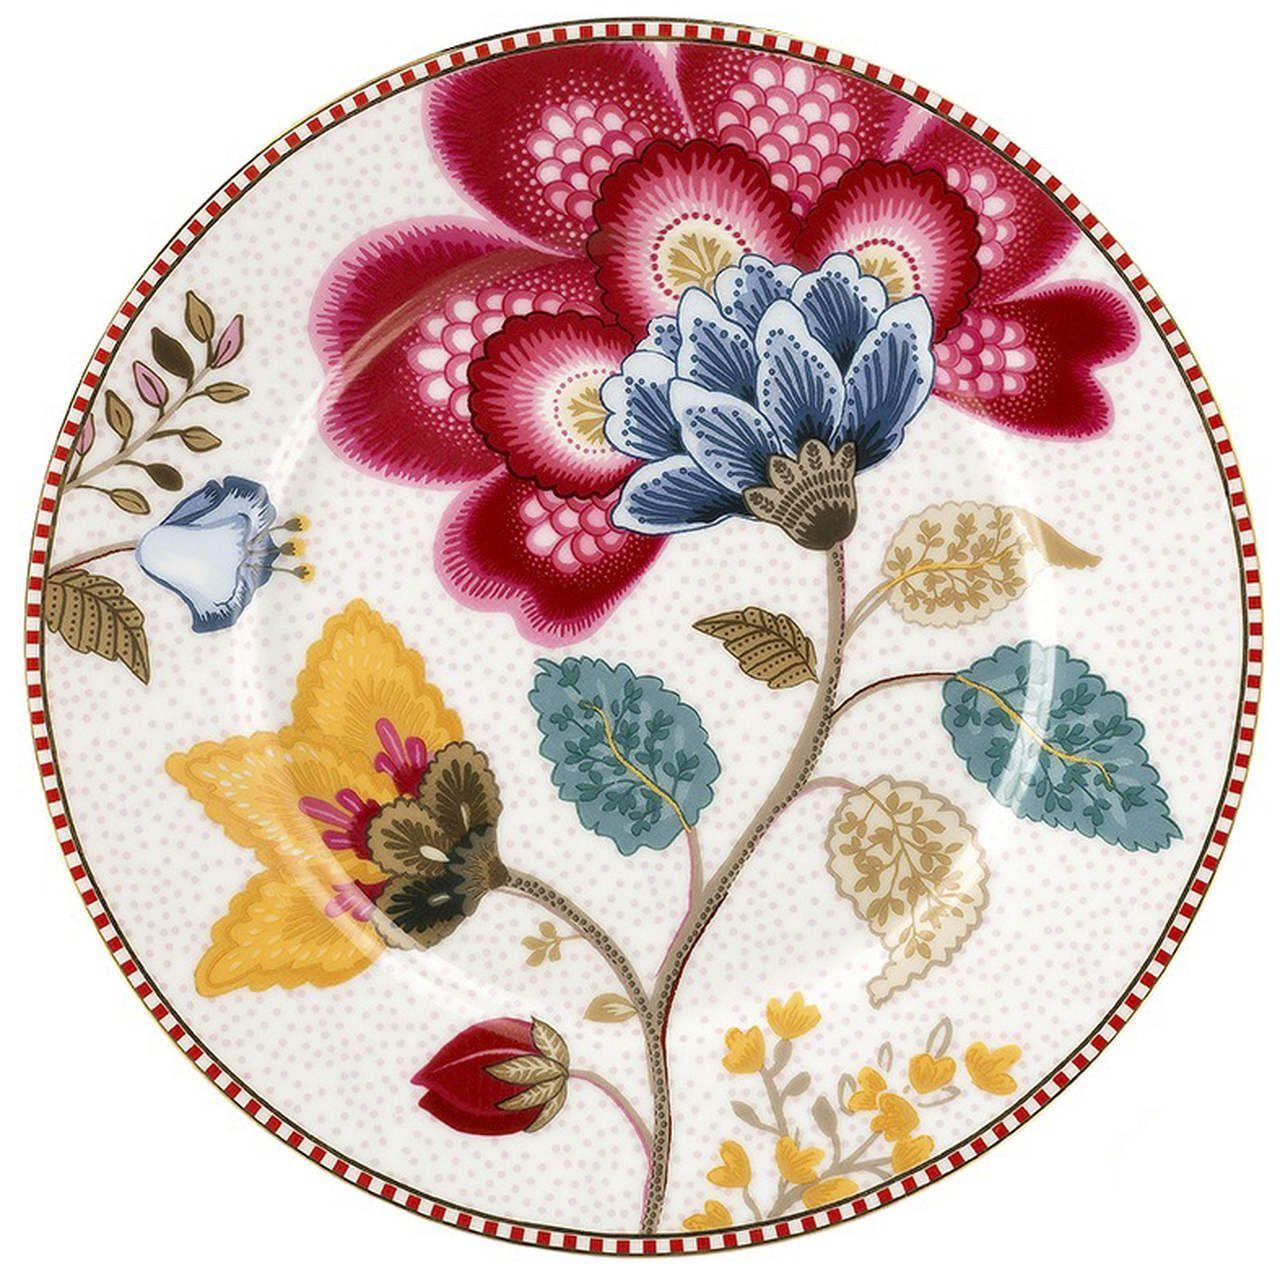 Prato de Pão Branco - Floral Fantasy - Pip Studio